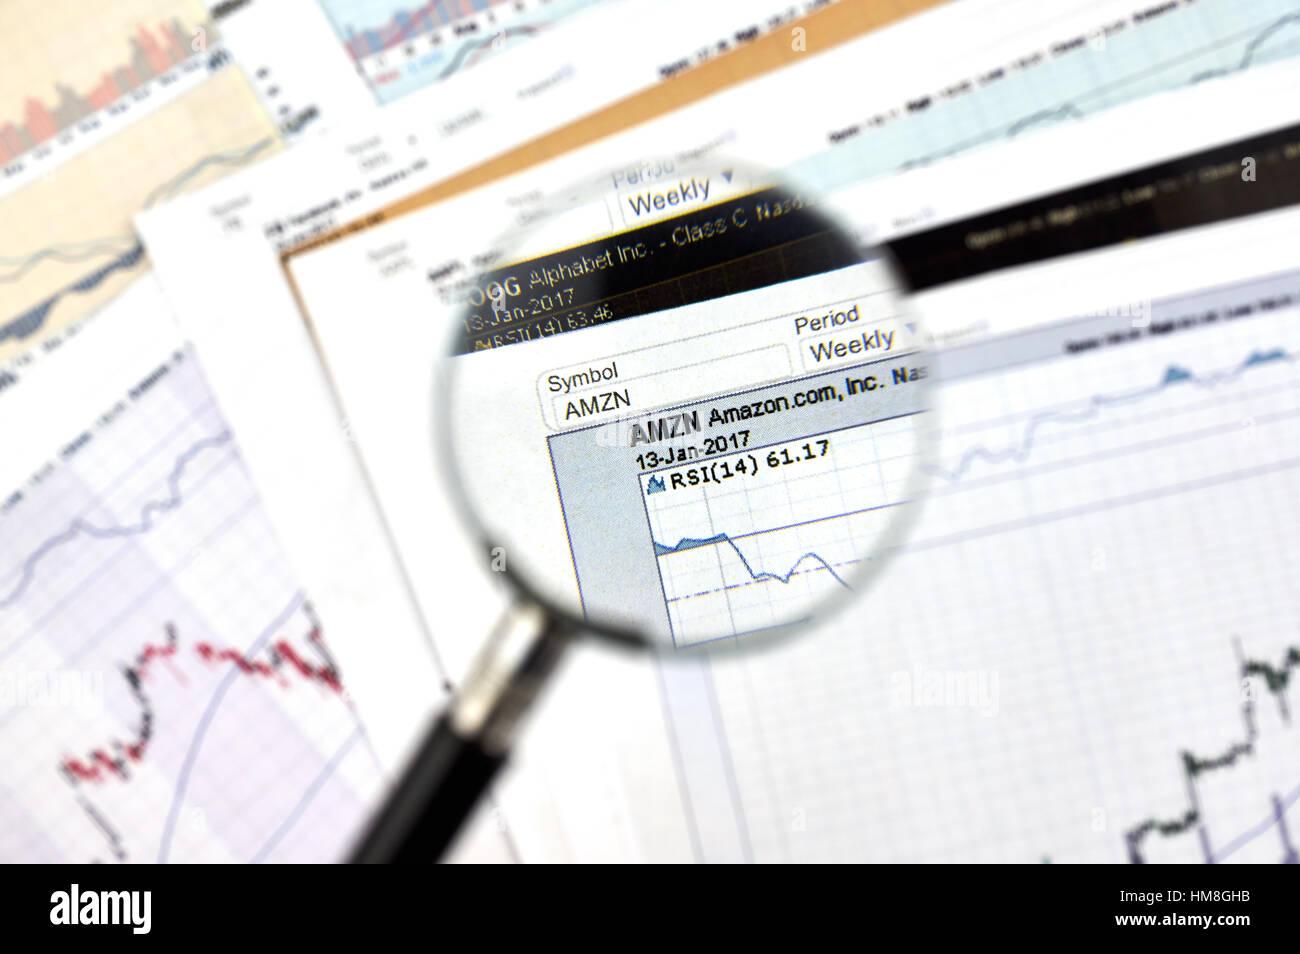 Montreal canada january 20 2017 amazon stock exchange ticker montreal canada january 20 2017 amazon stock exchange ticker under magnifying glass on candlestick background buycottarizona